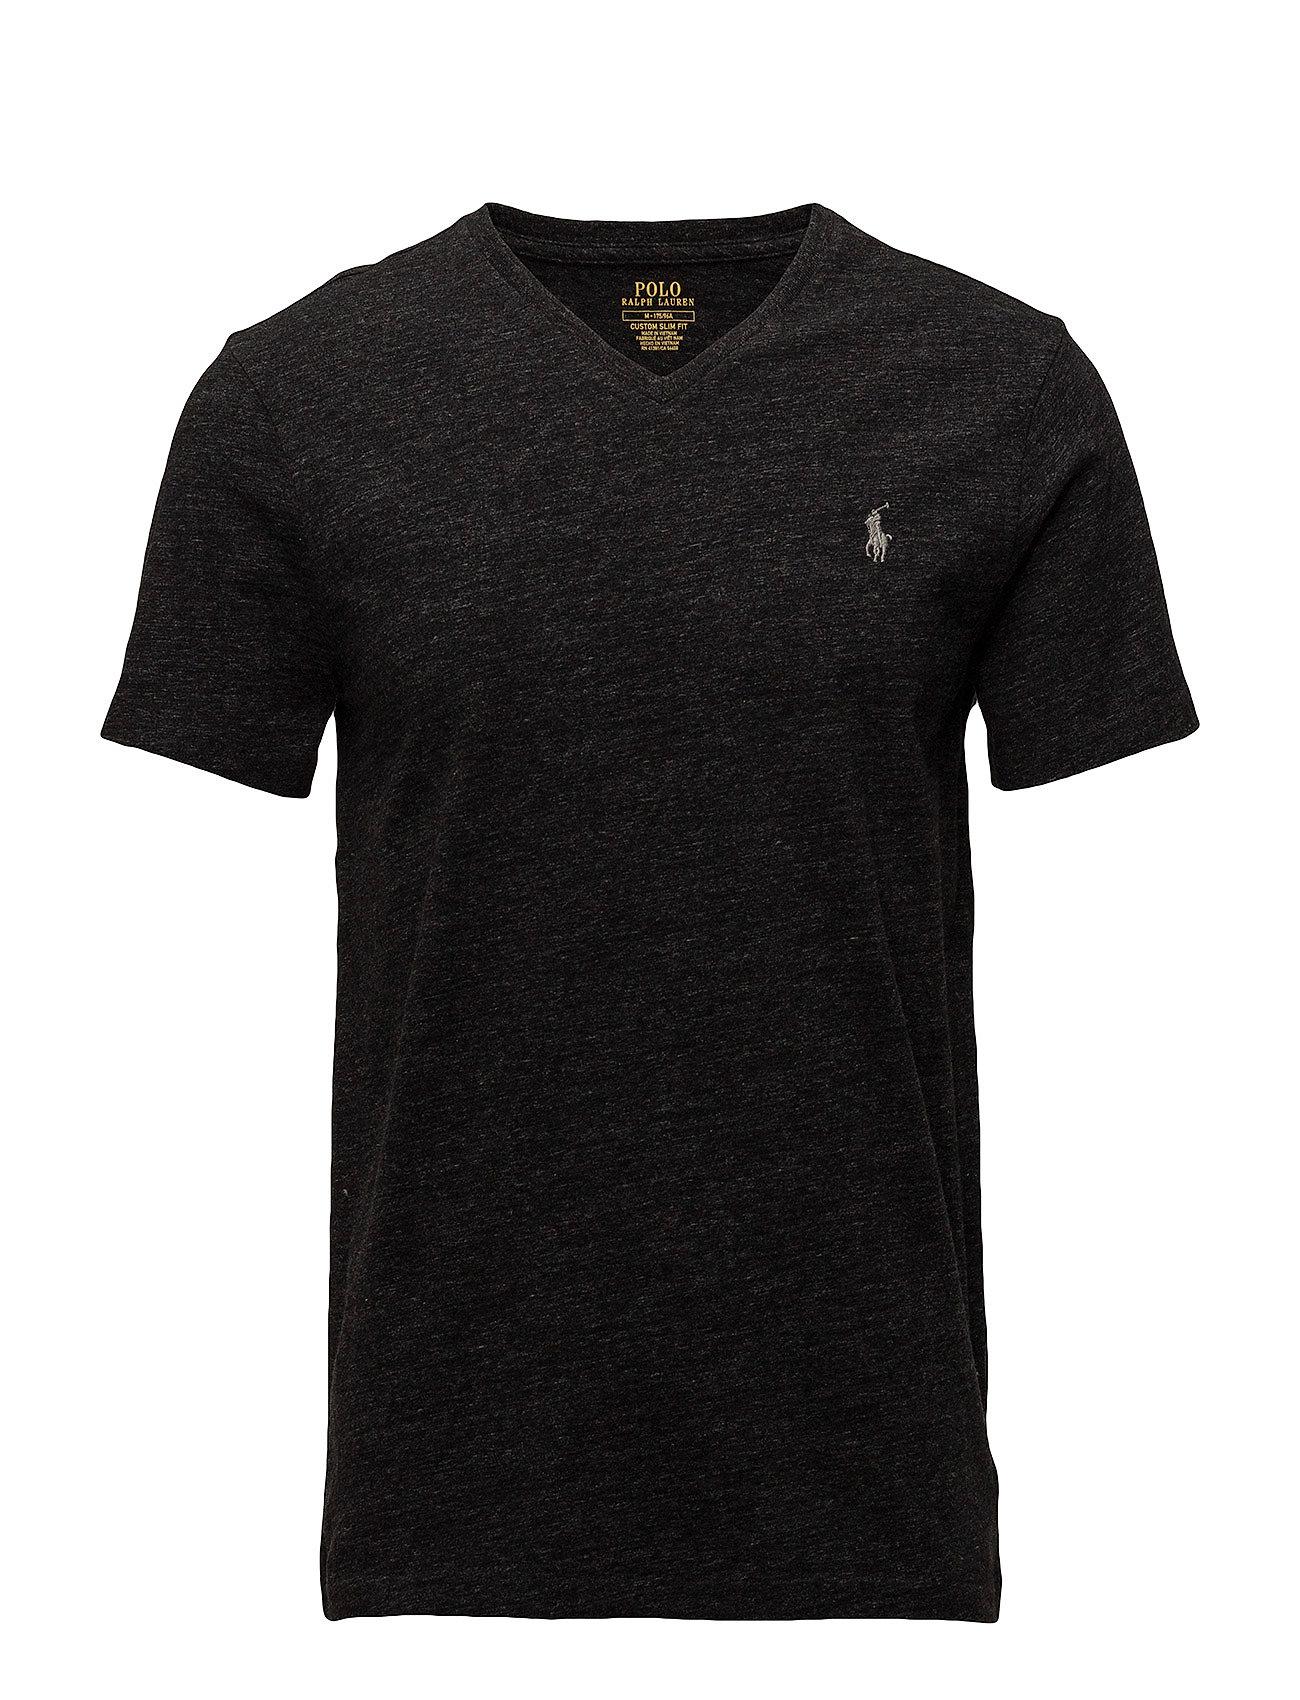 Polo Ralph Lauren Custom Slim Cotton T-Shirt